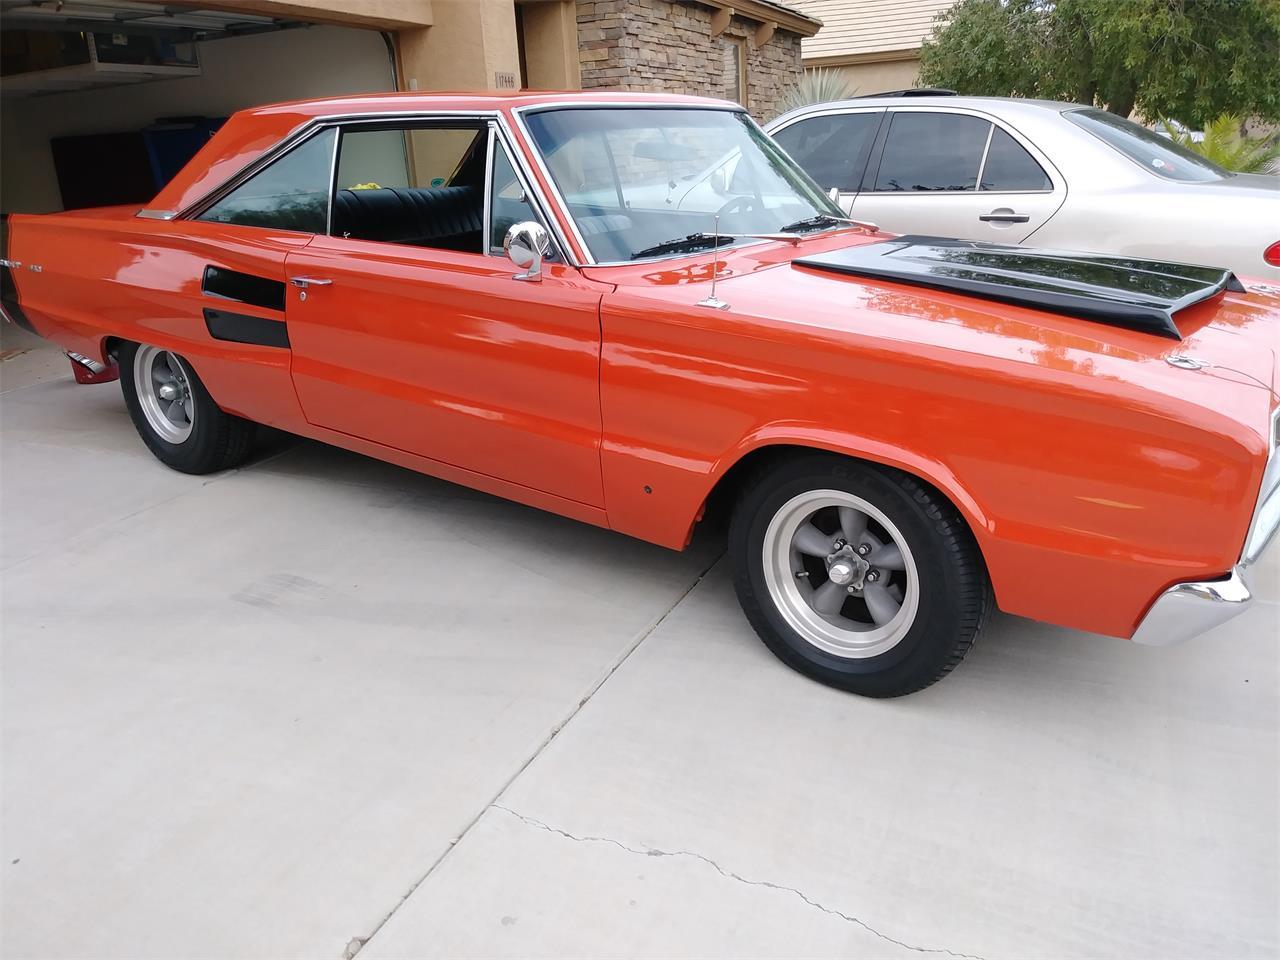 1967 Dodge Coronet 440 For Sale Classiccars Com Cc 1167341